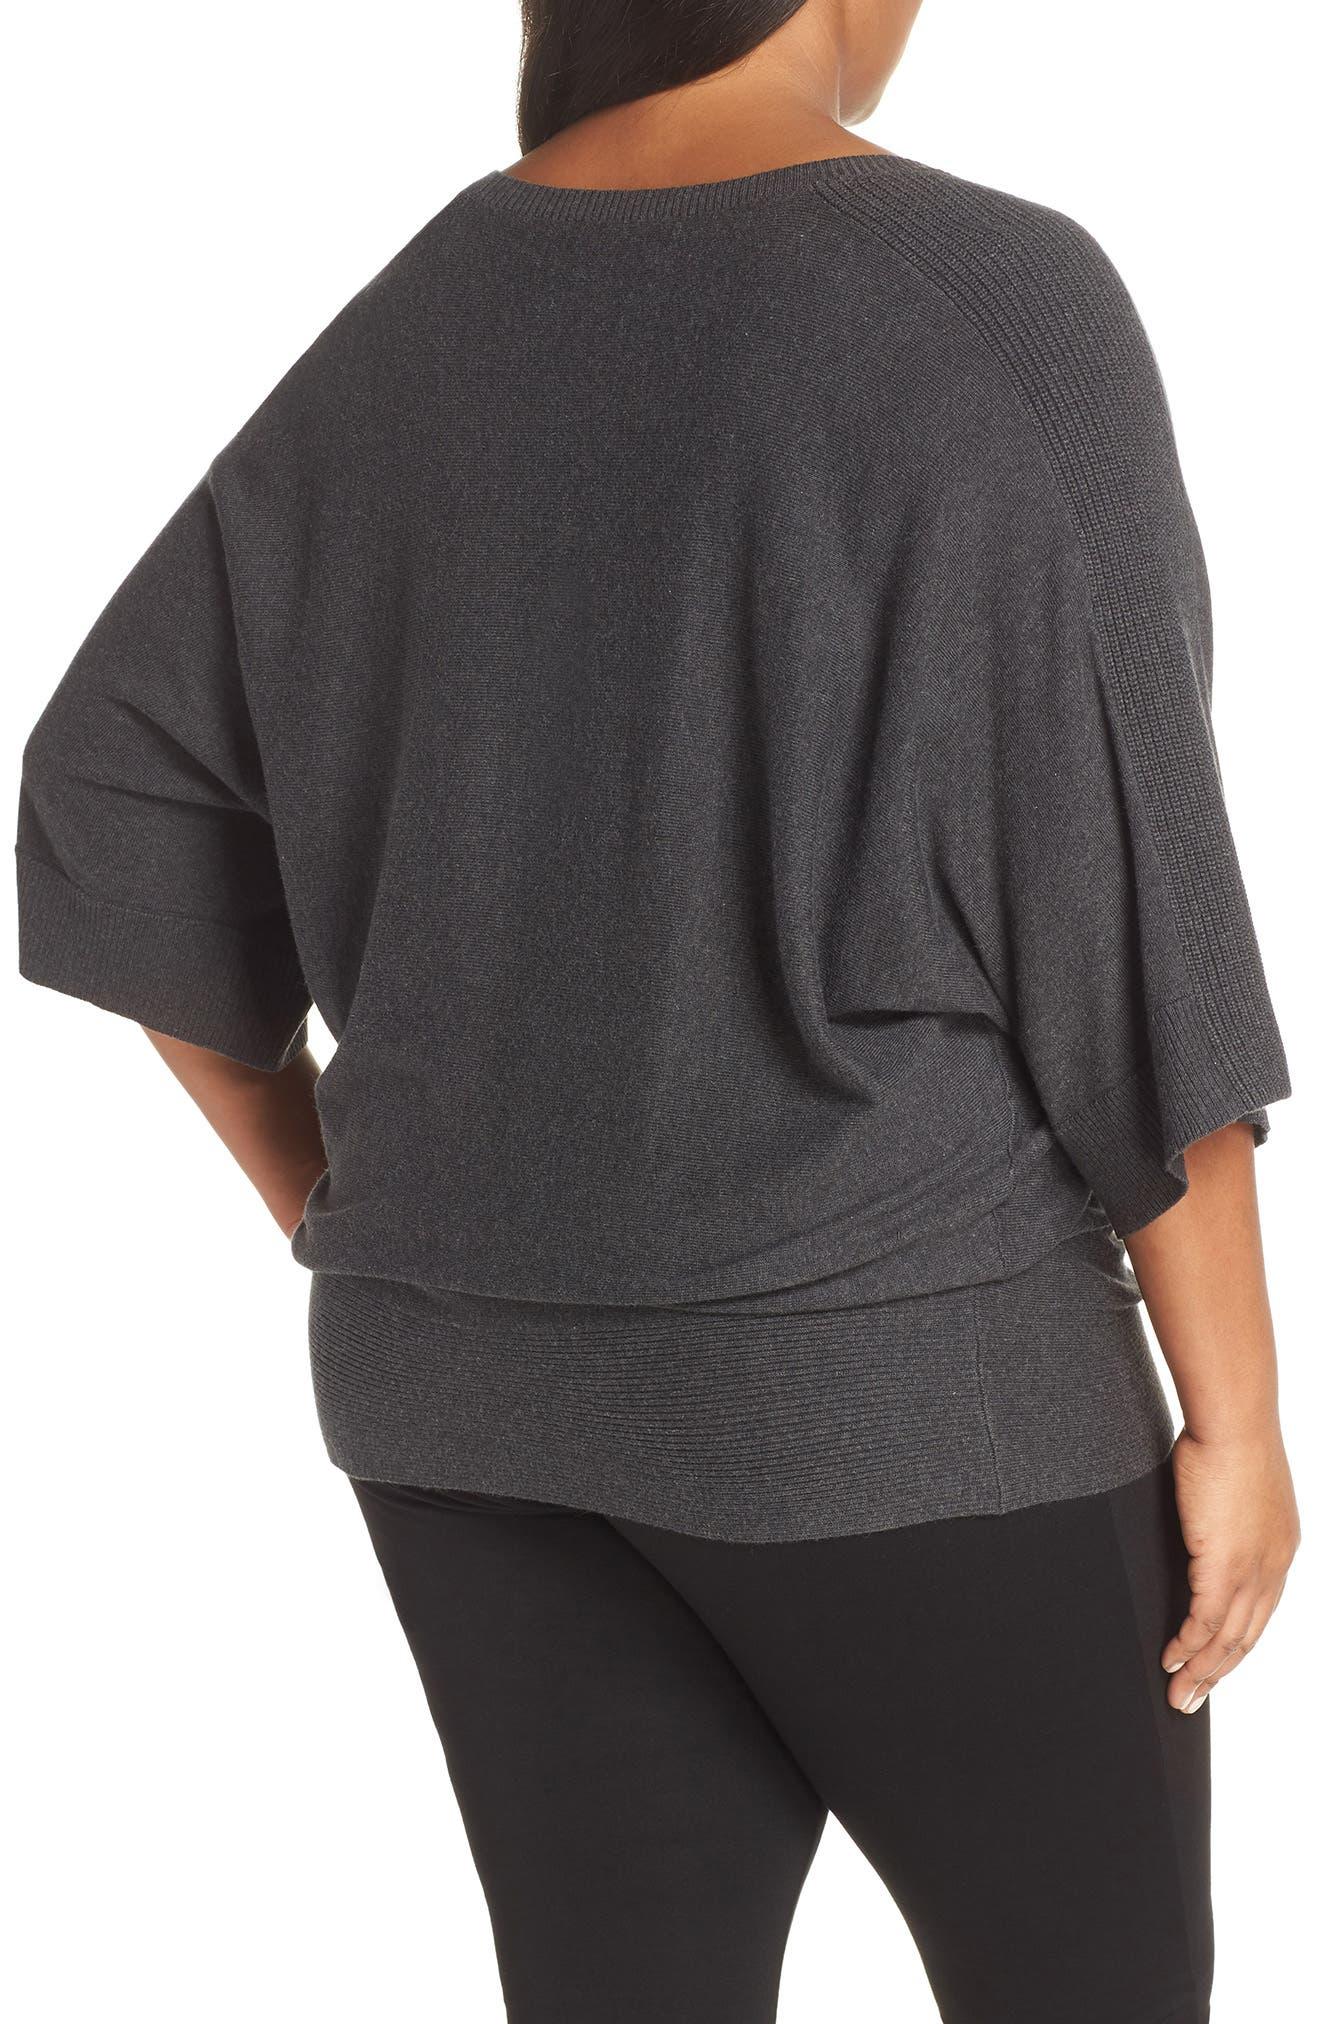 Cotton Blend Kimono Sweater,                             Alternate thumbnail 2, color,                             GREY DARK CHARCOAL HEATHER